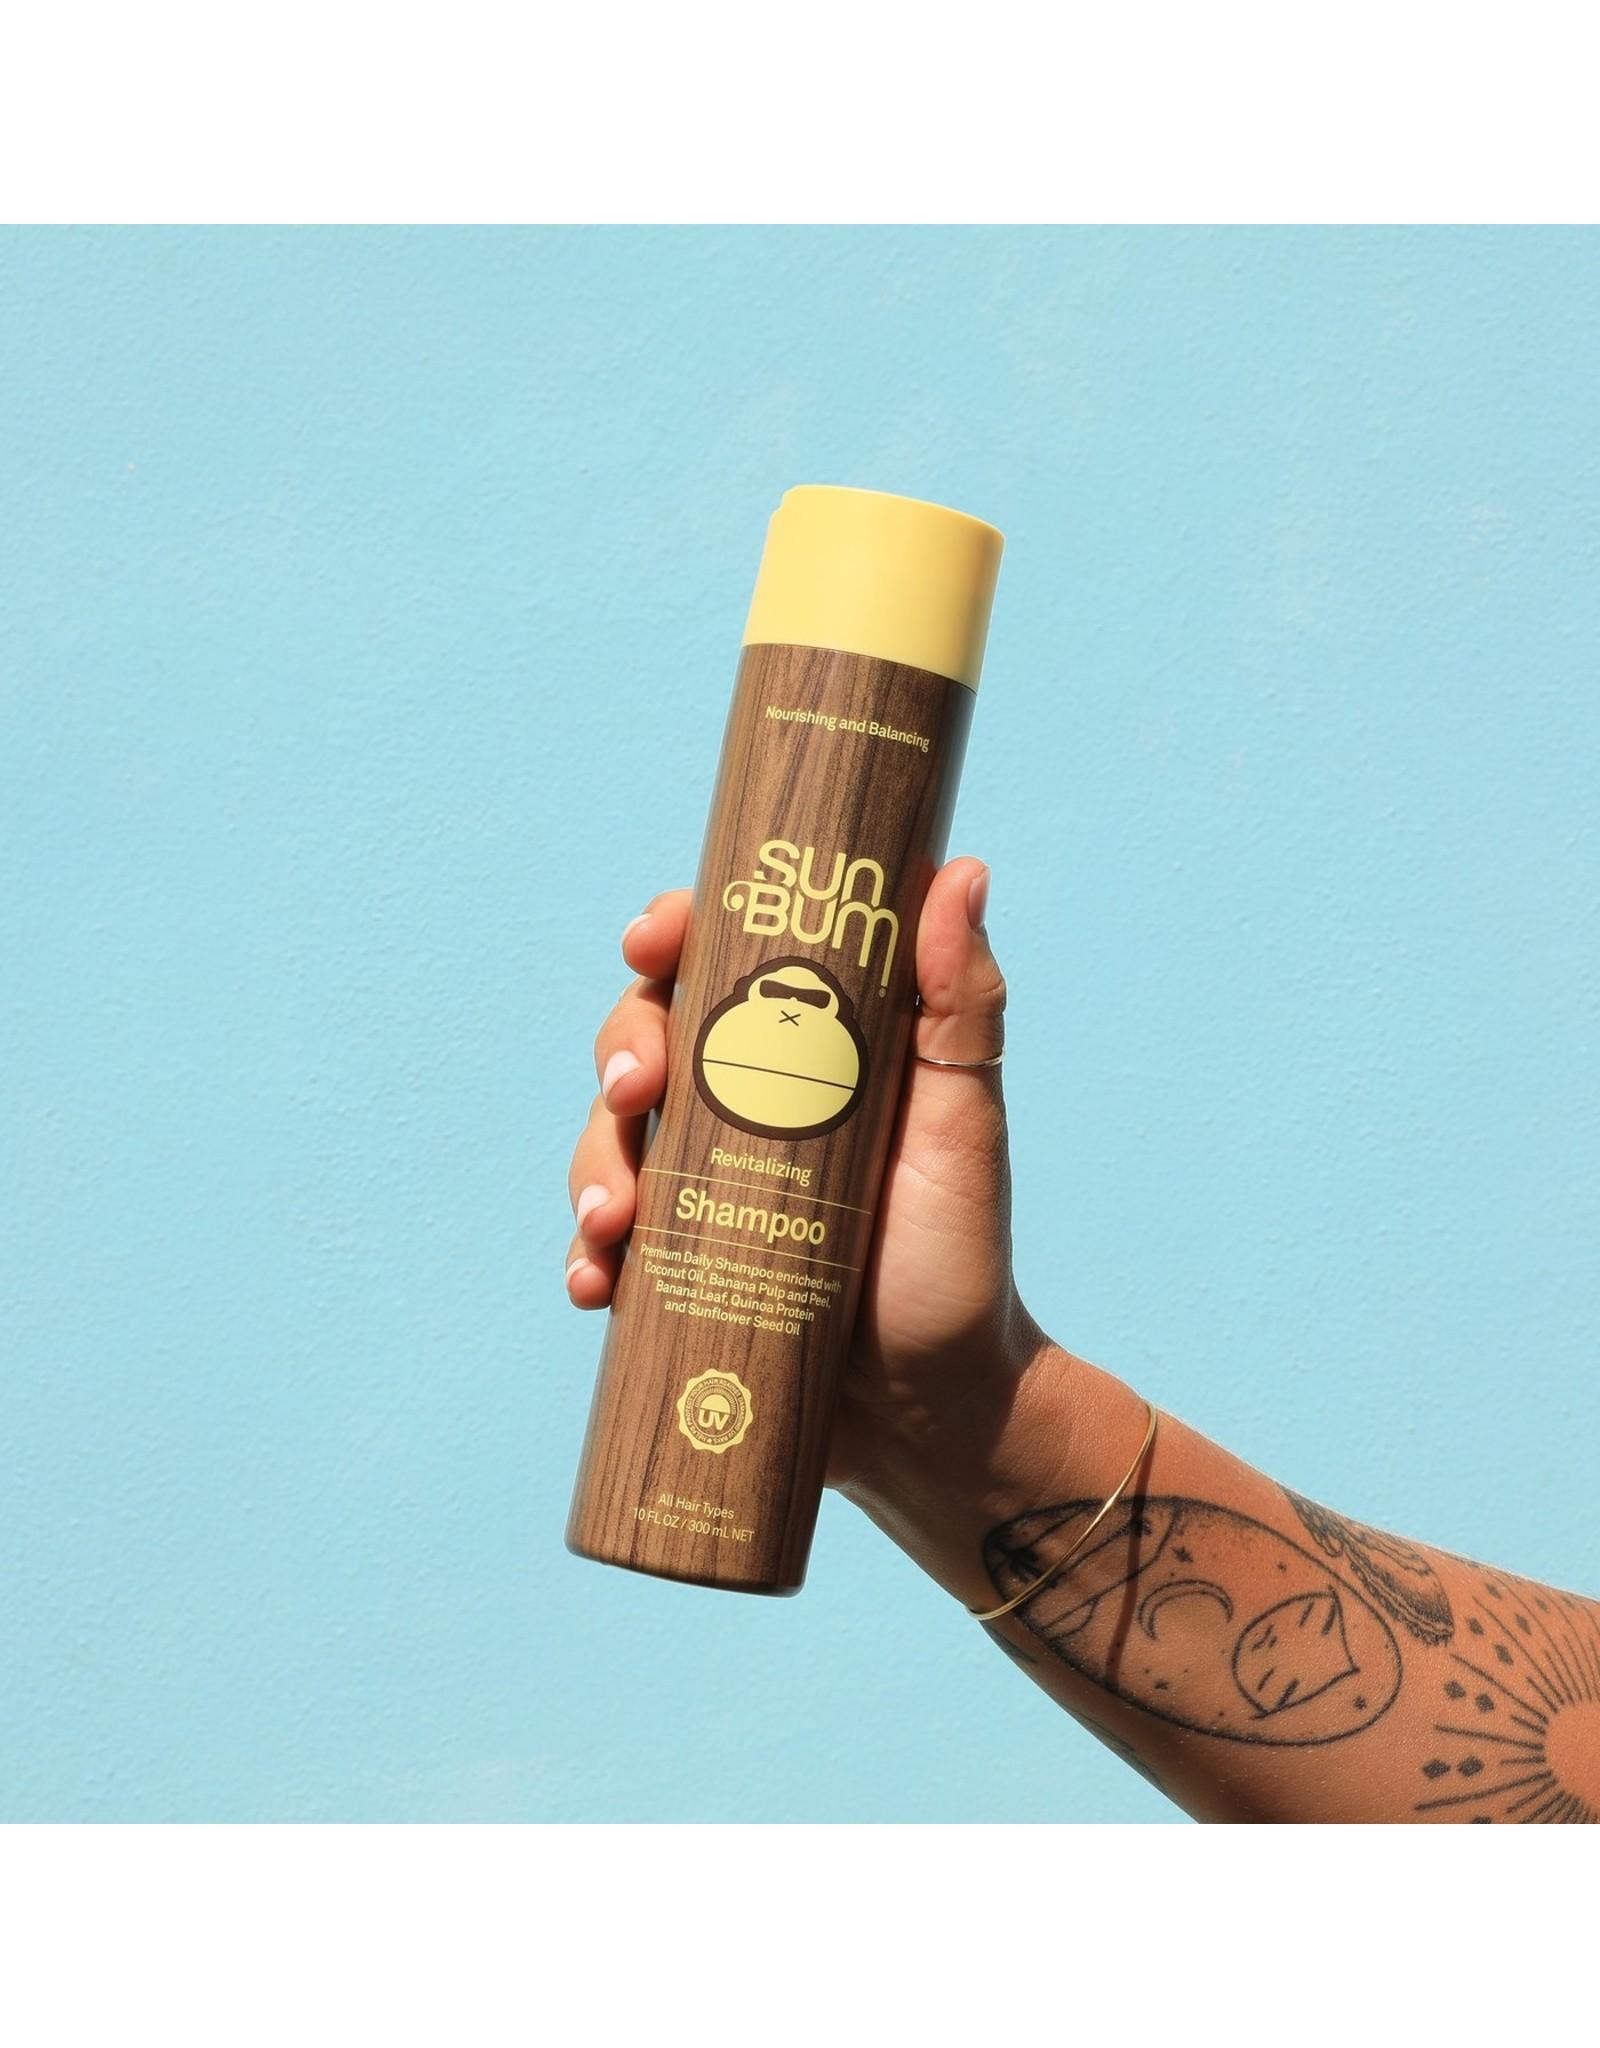 Sun Bum Revitalizing Shampoo